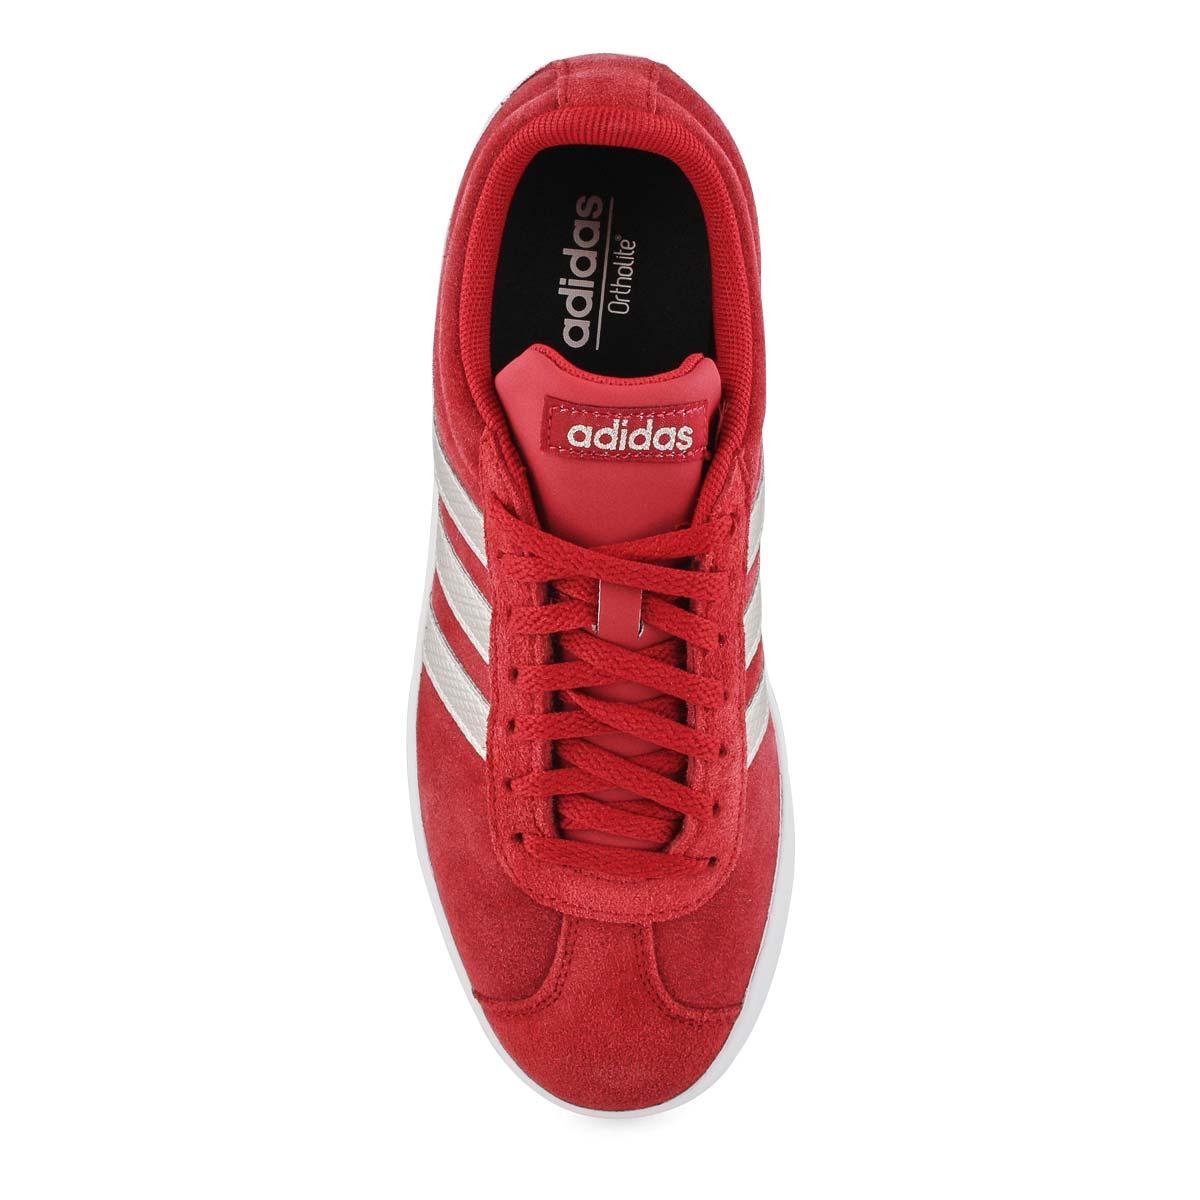 Lds VL Court 2.0 maroon/wht sneaker